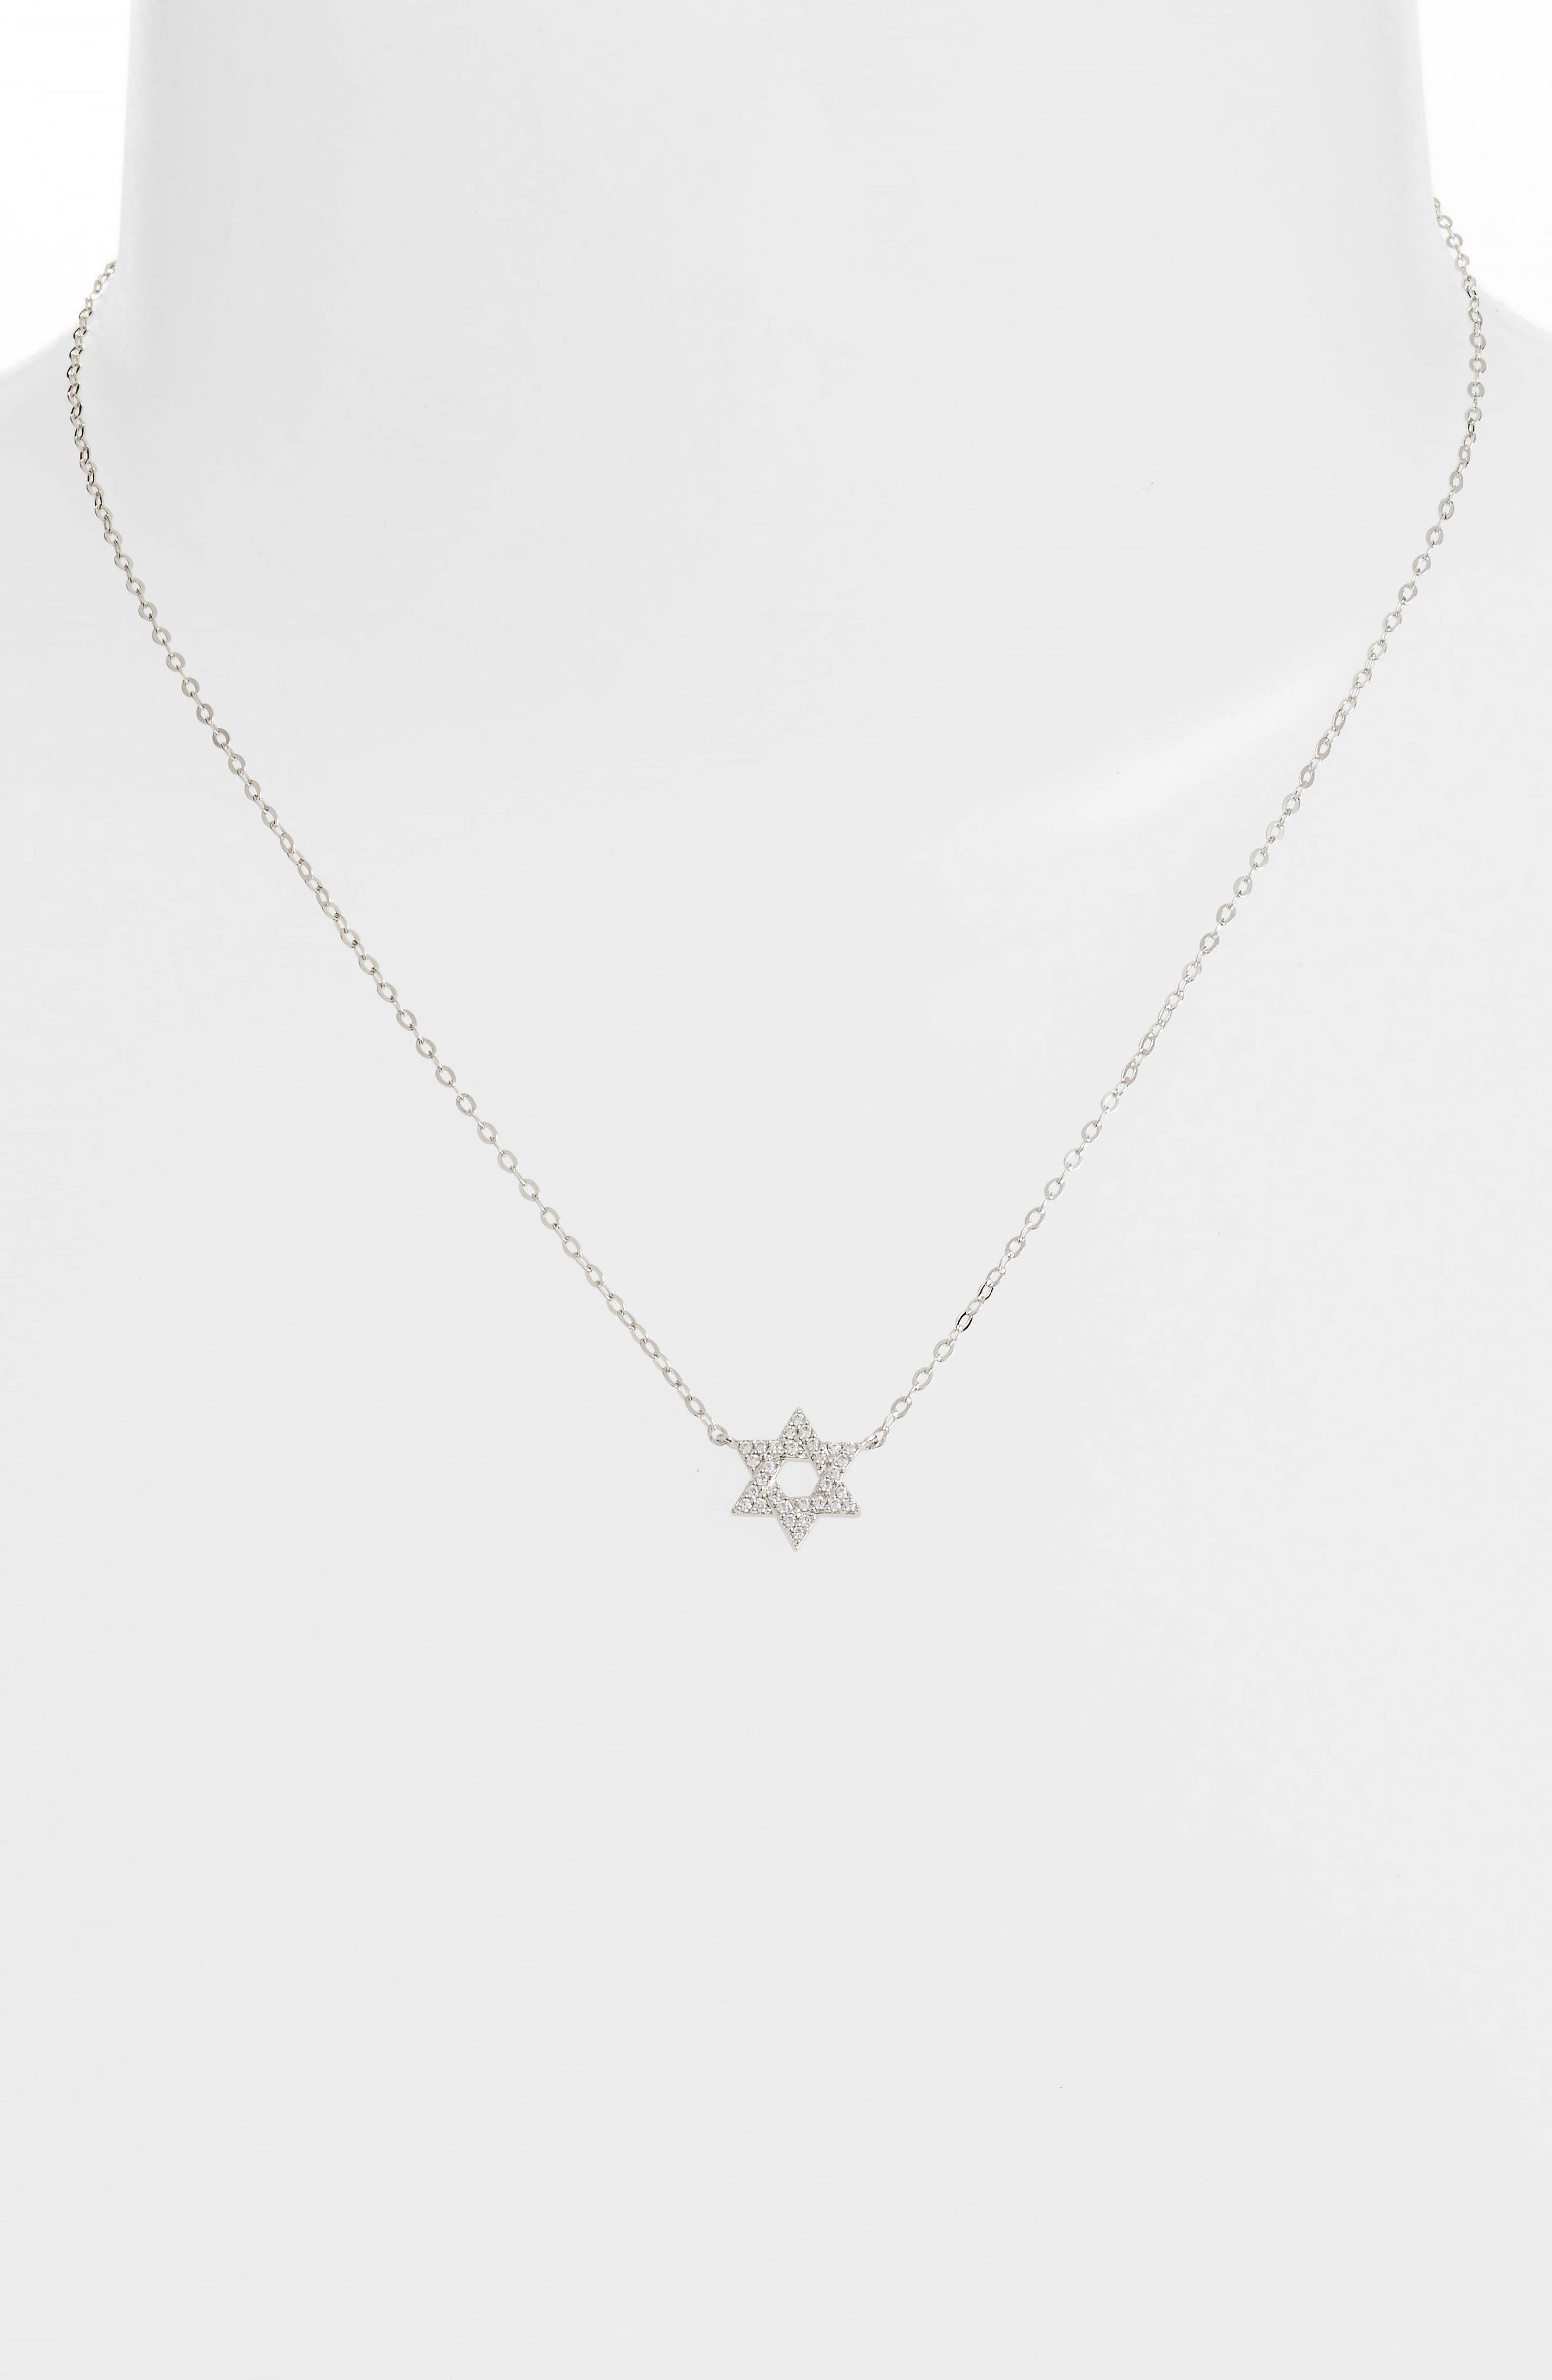 Reminisce Star of David Pendant Necklace,                             Alternate thumbnail 2, color,                             044